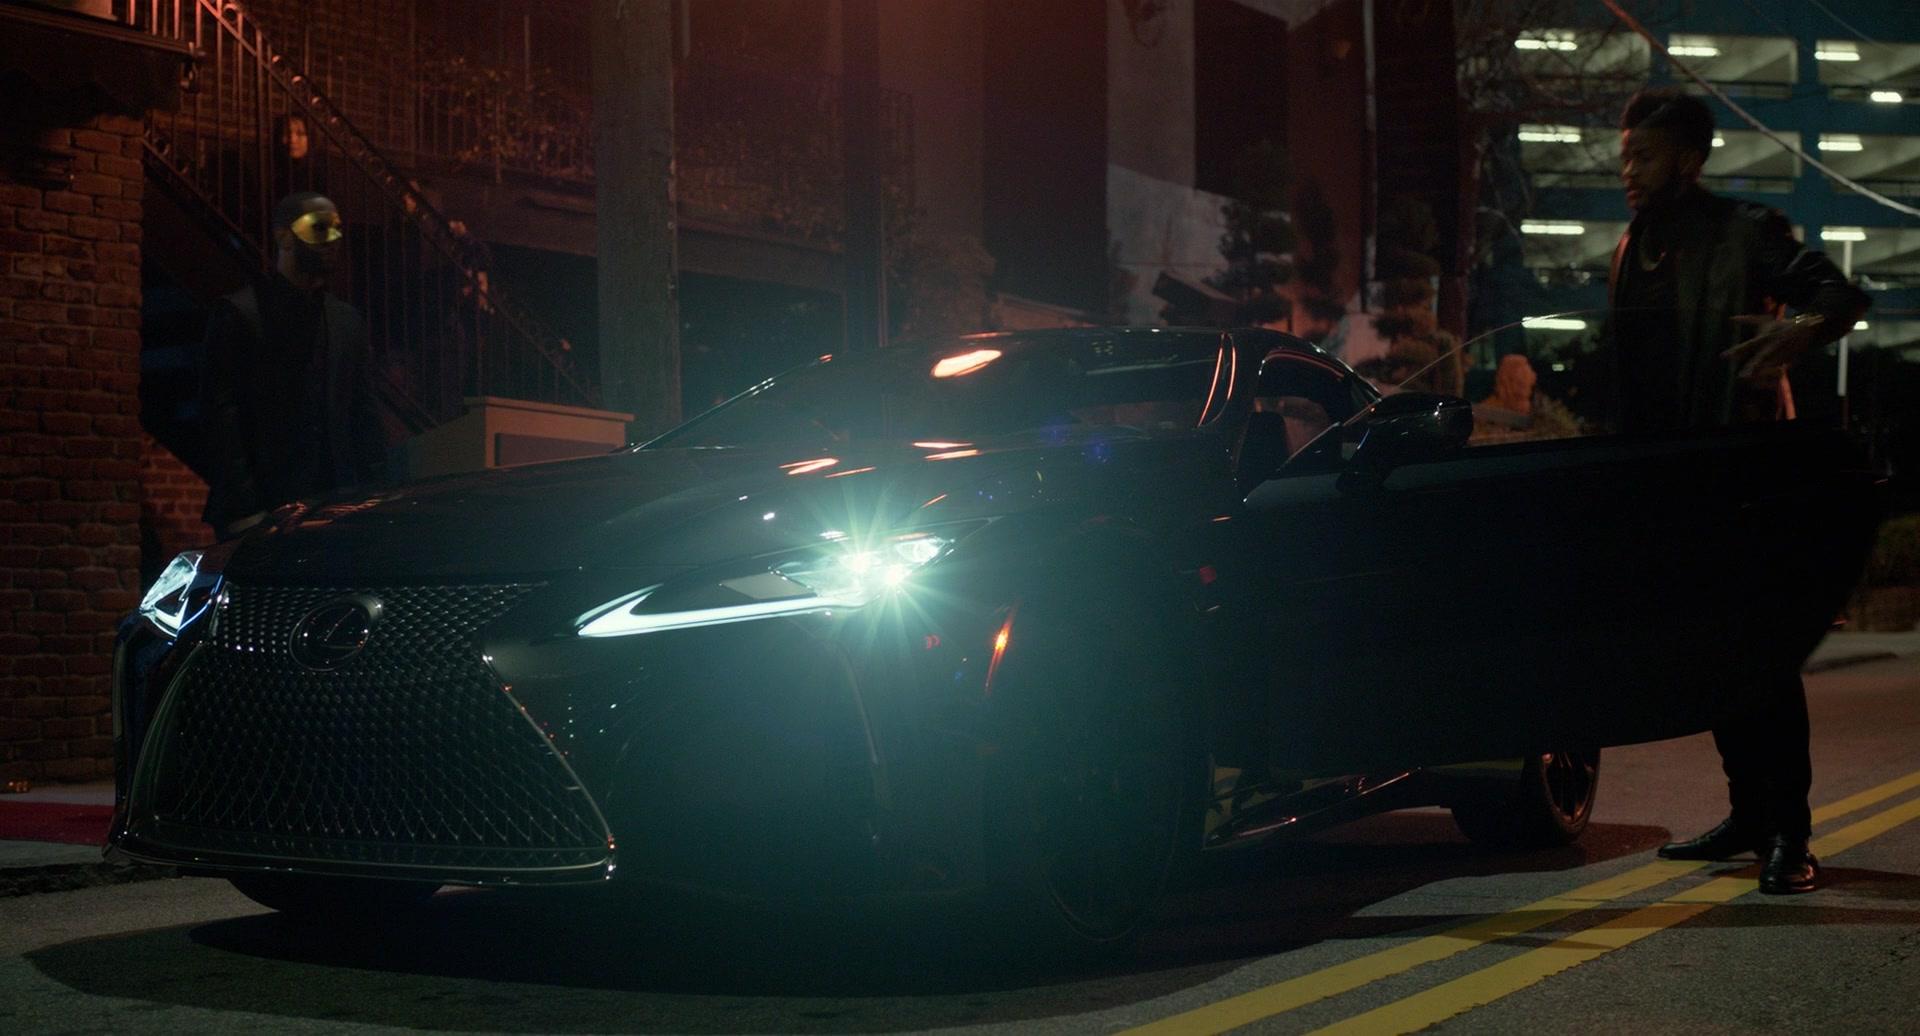 Range Rover Sport >> Lexus LC Car in SuperFly (2018) Movie